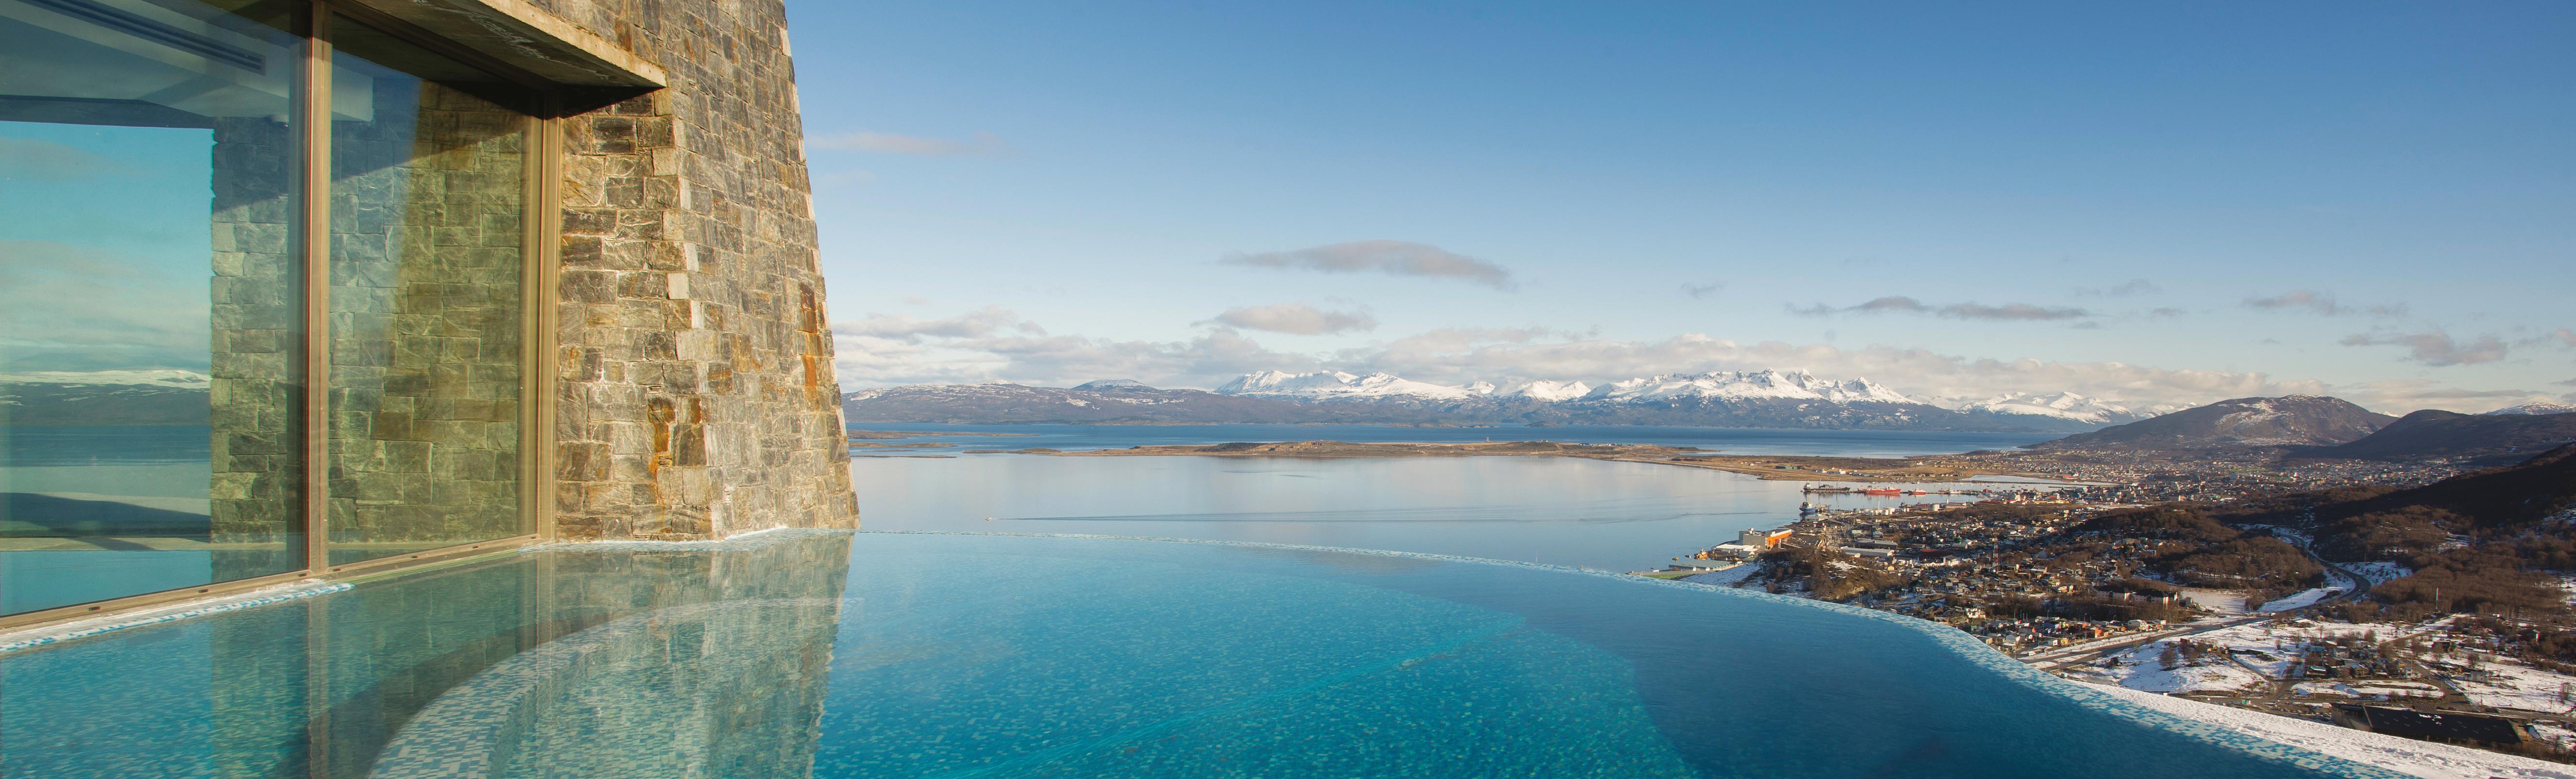 arakur-ushuaia-patagonia-view